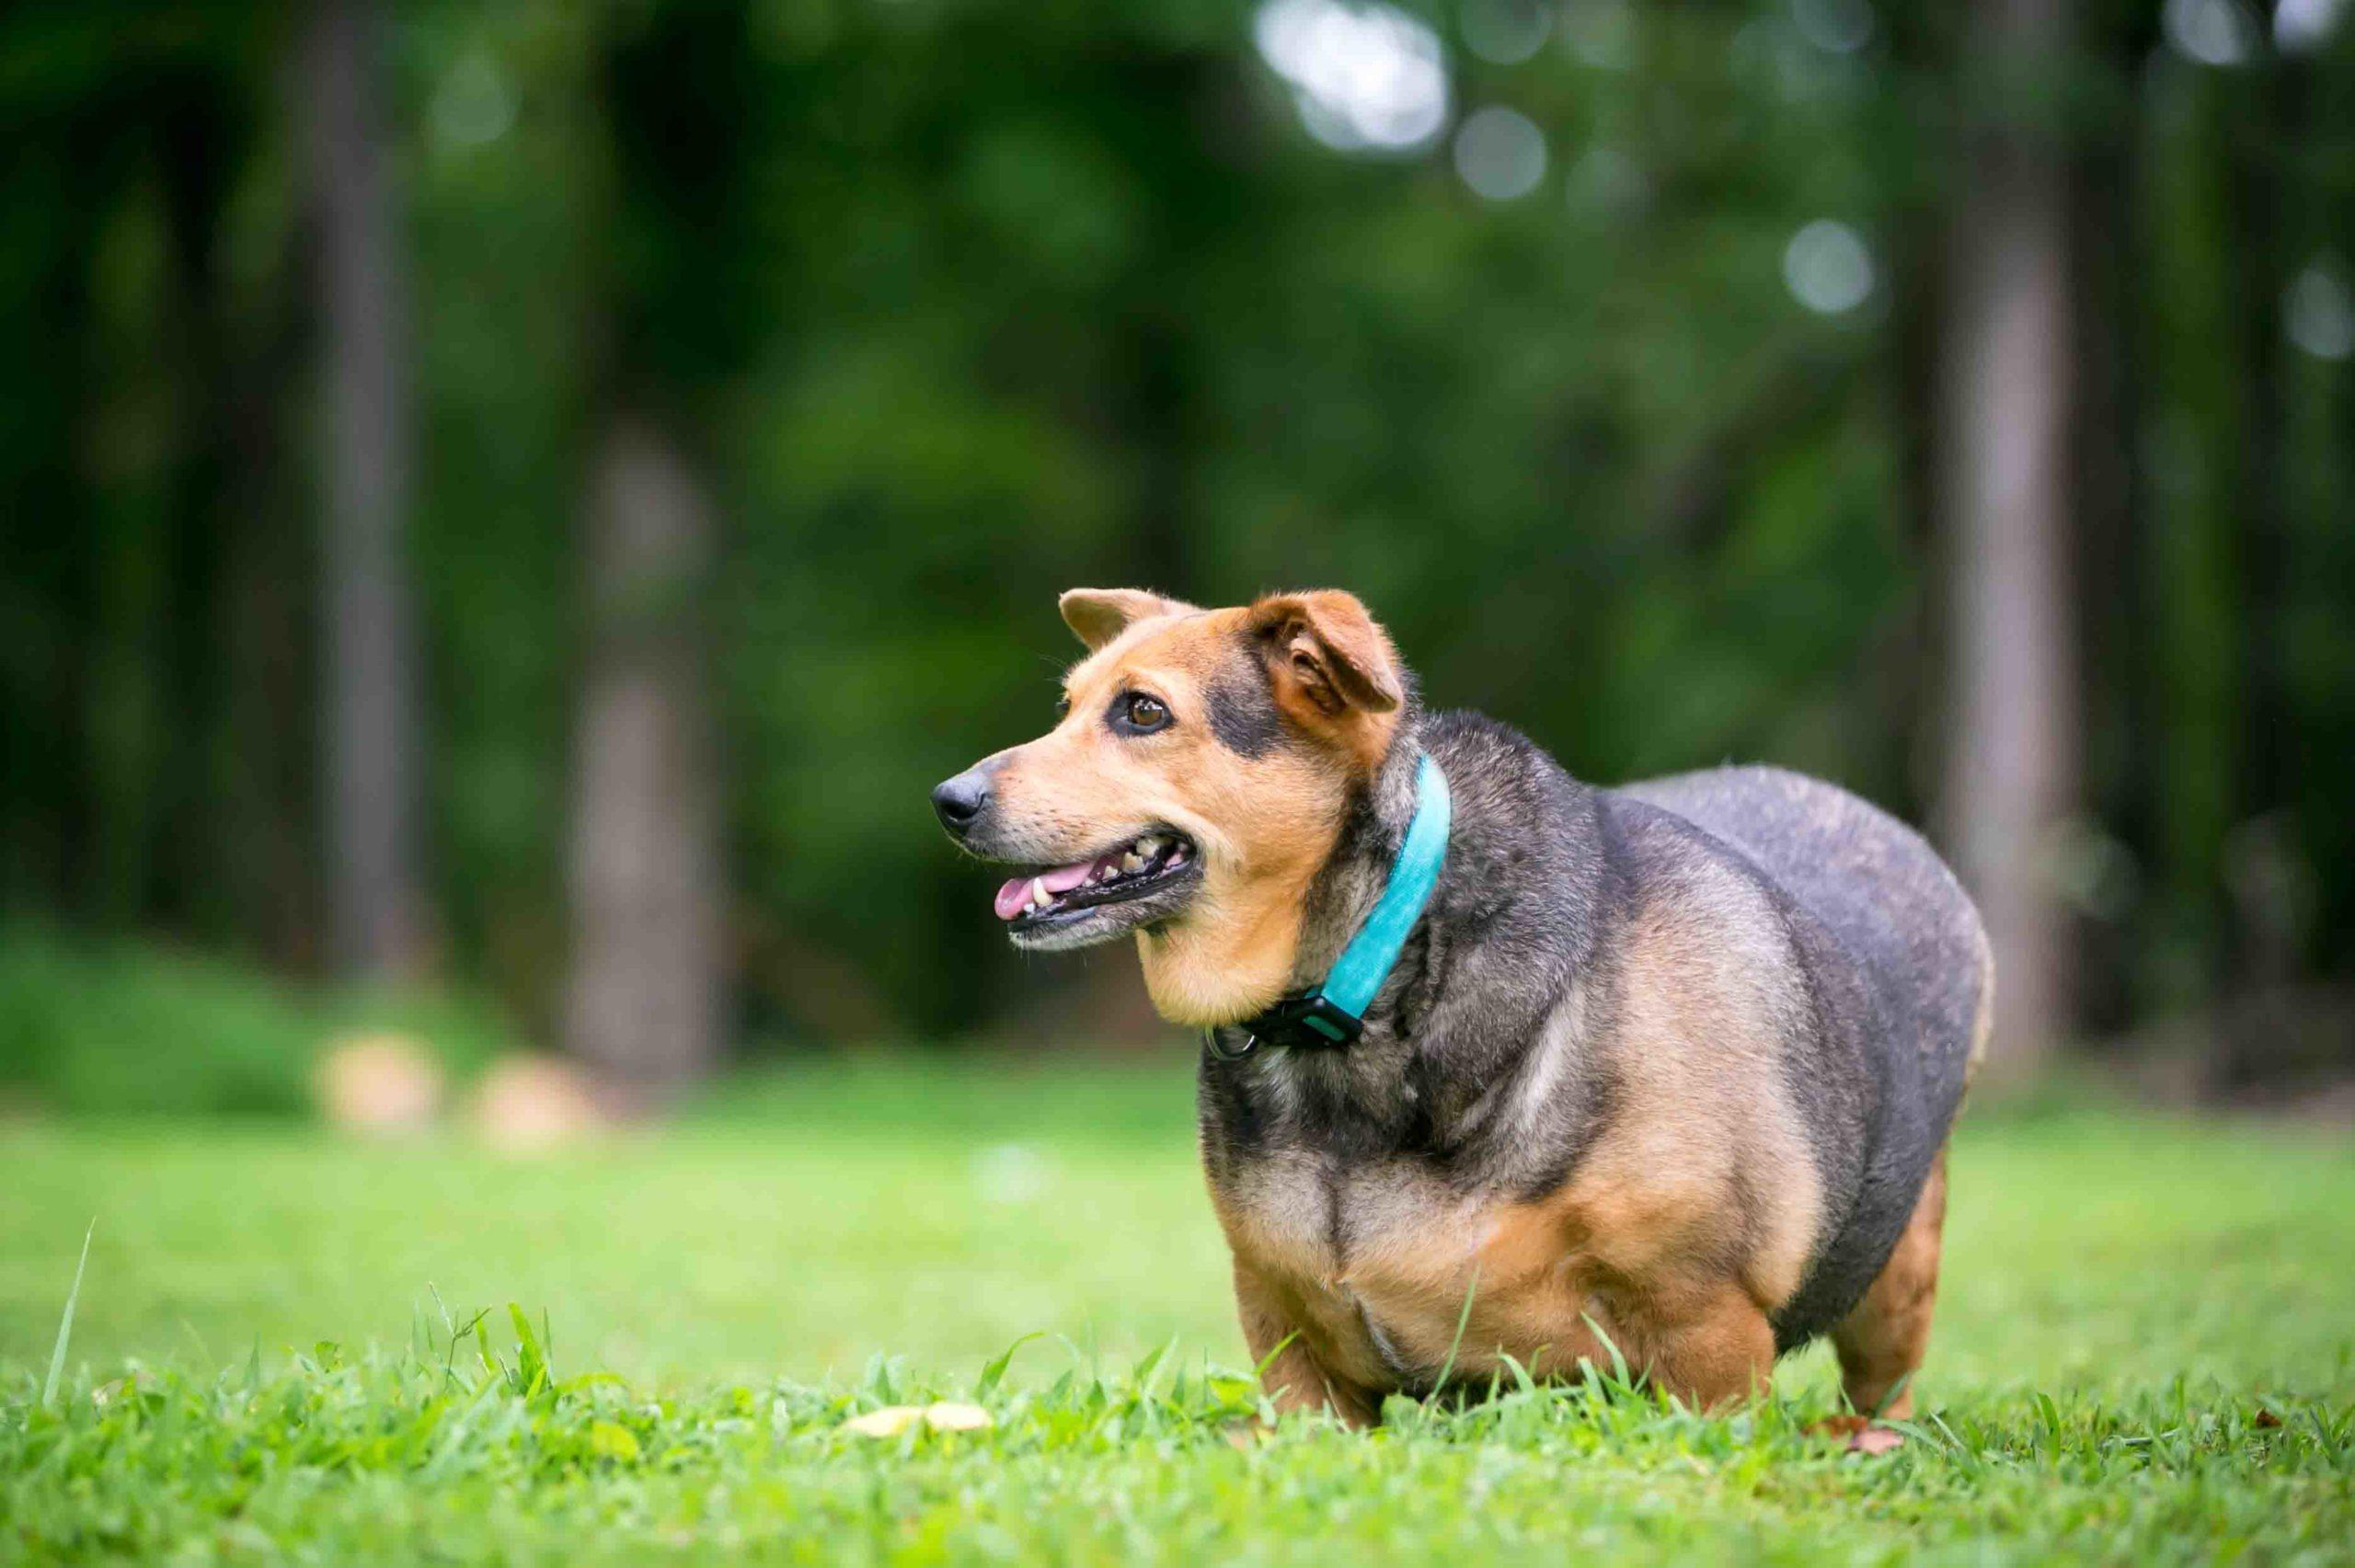 overvægt hos kæledyr